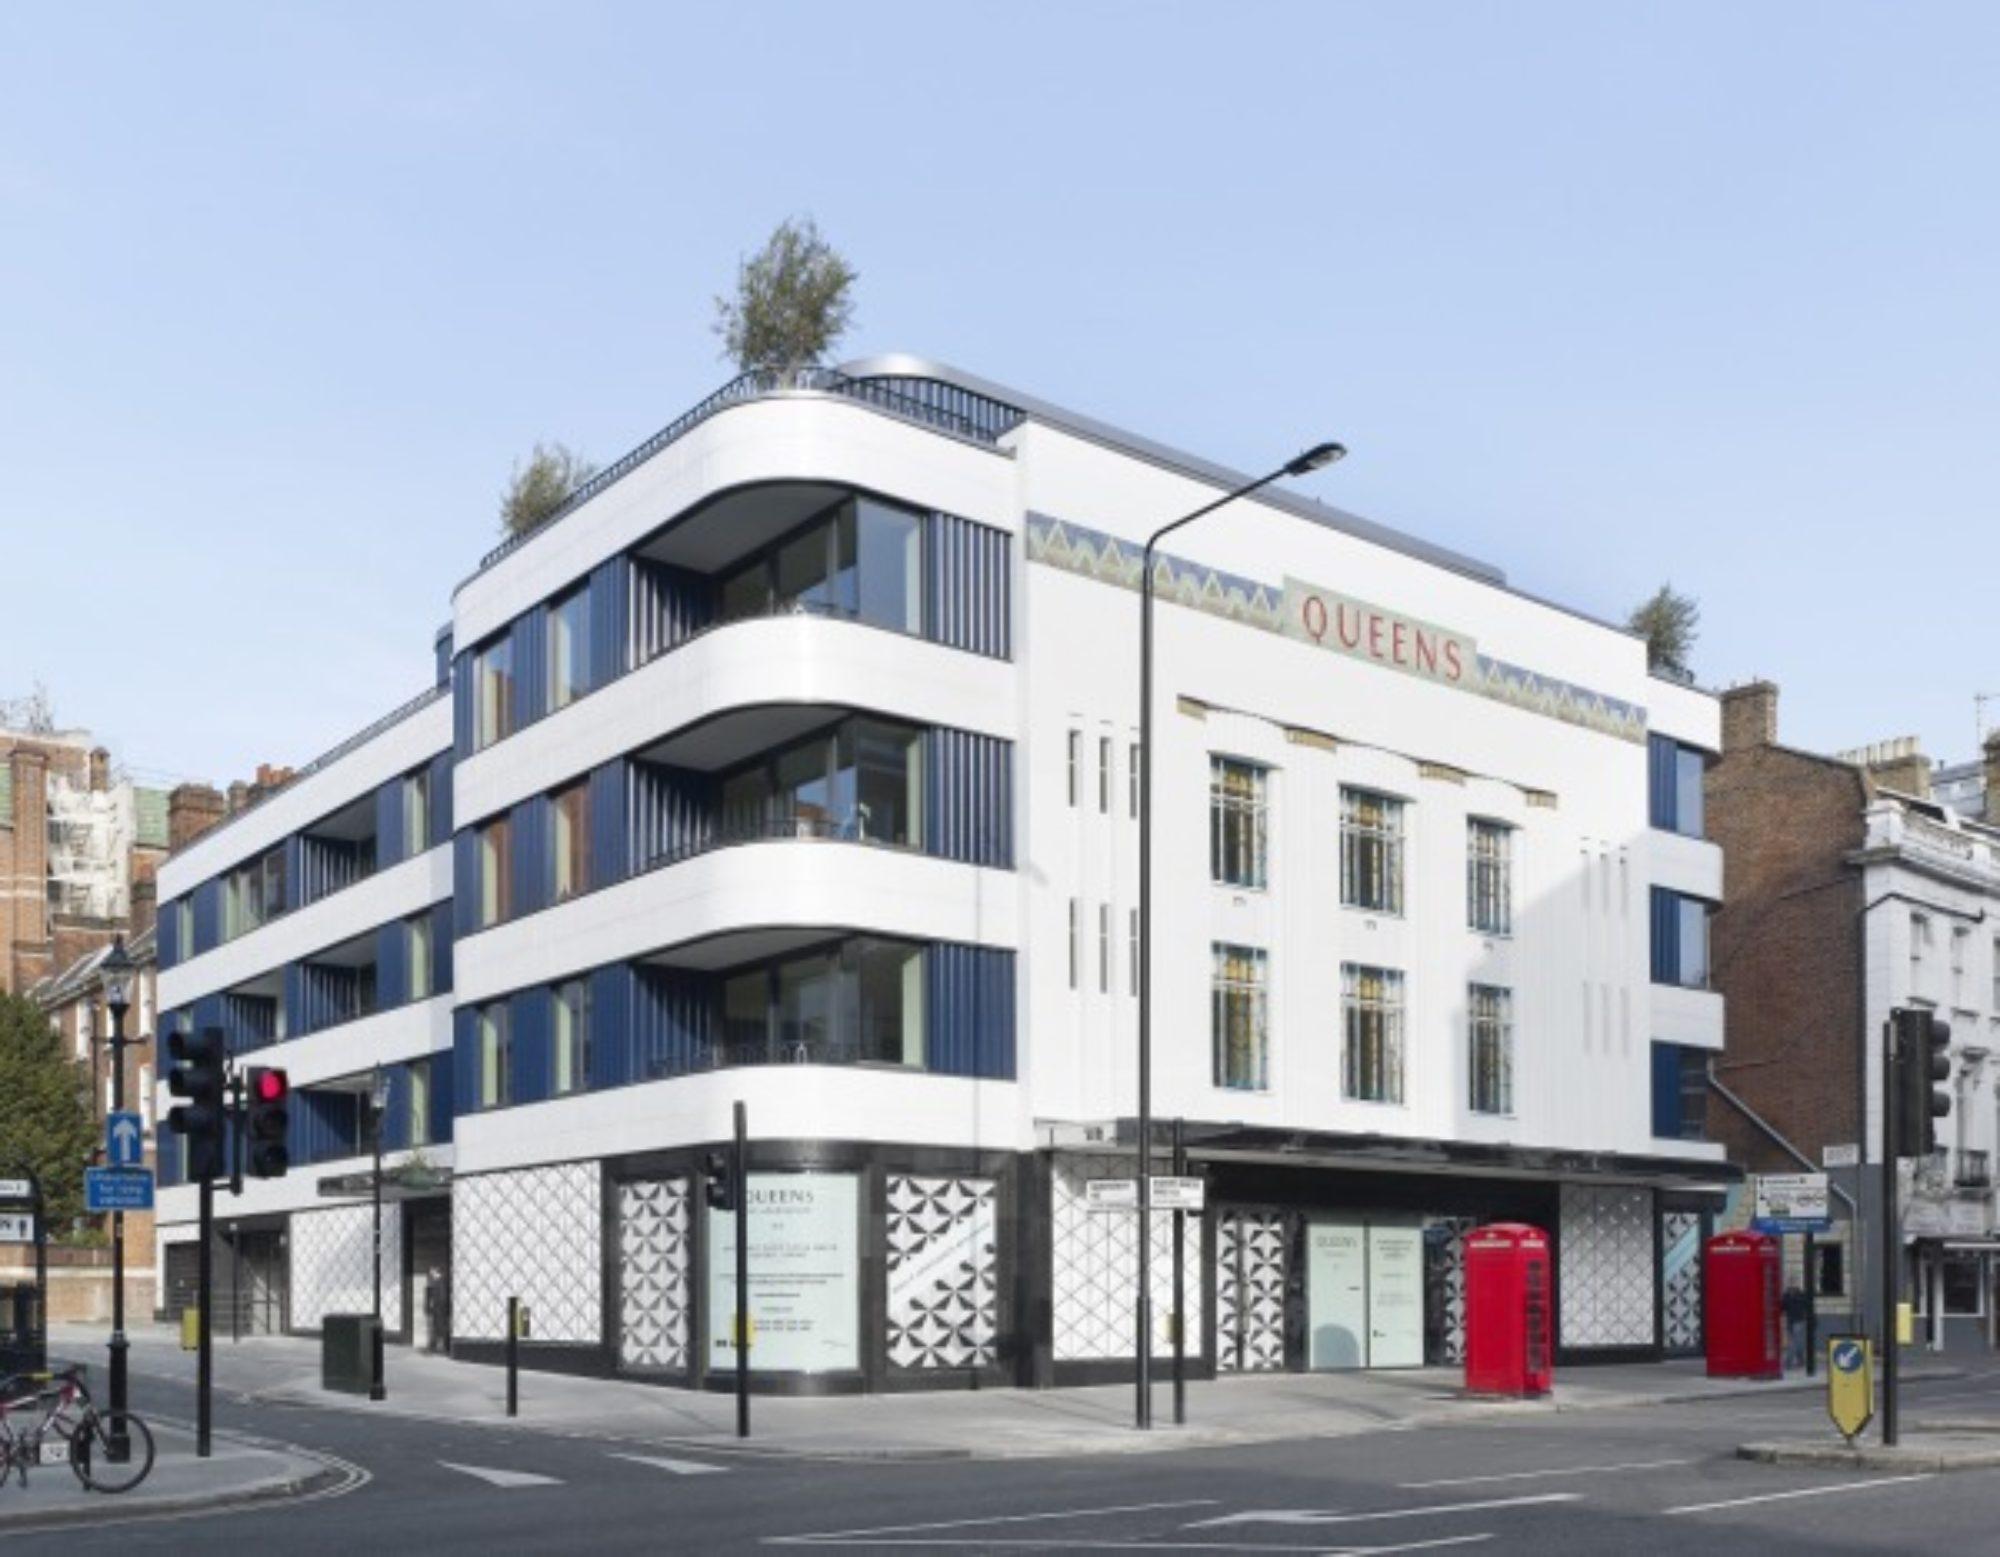 Queens Building wins RIBA London award 2015